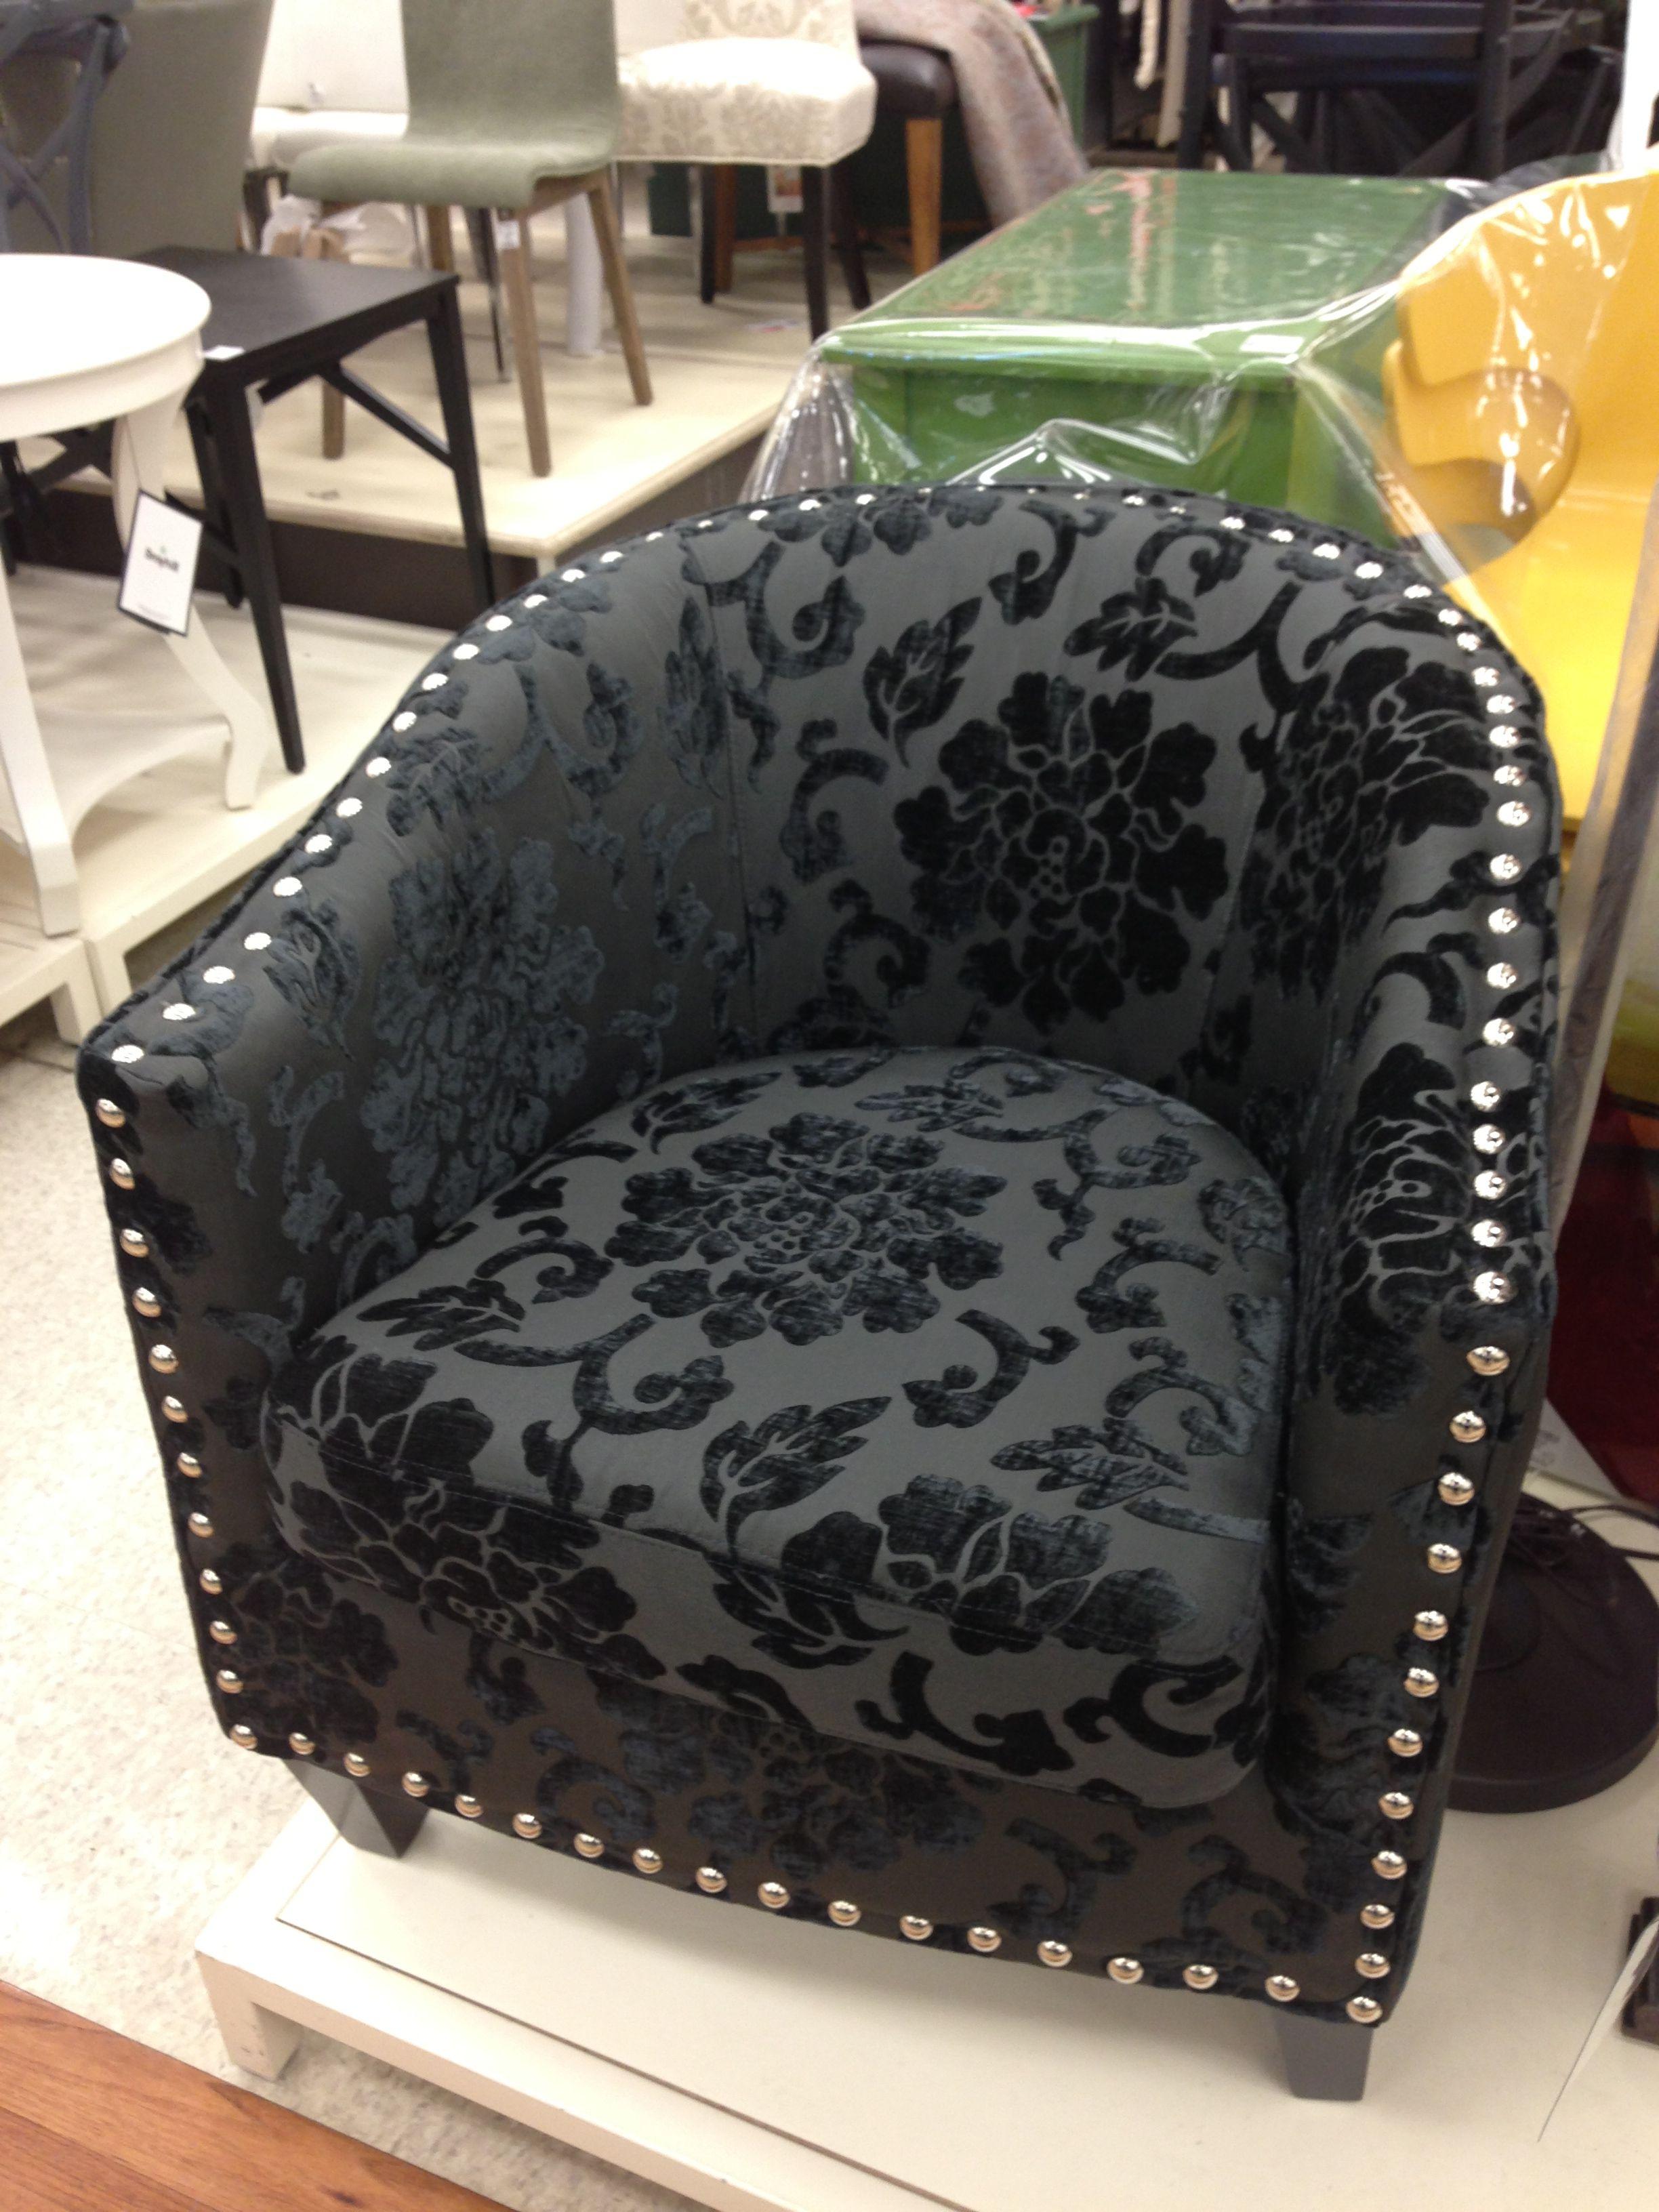 Black Damask Chair HomeSense Canada Home furnishings